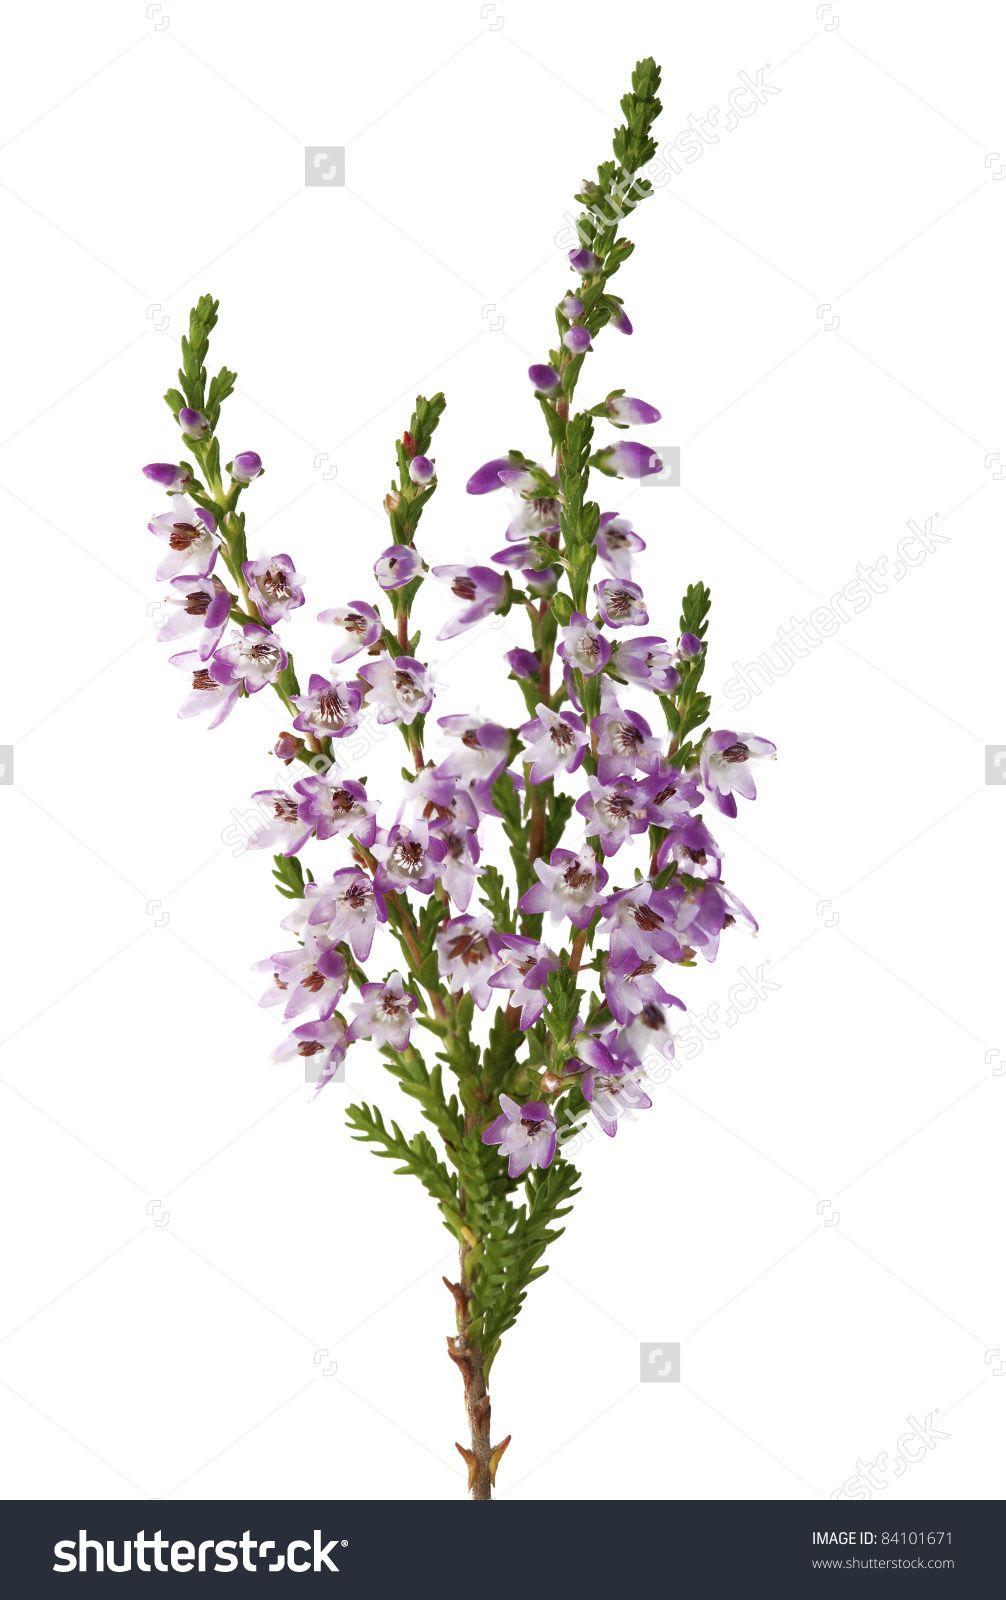 Image Result For Heather Sprig Flowers Purple Flowers Heather Flower